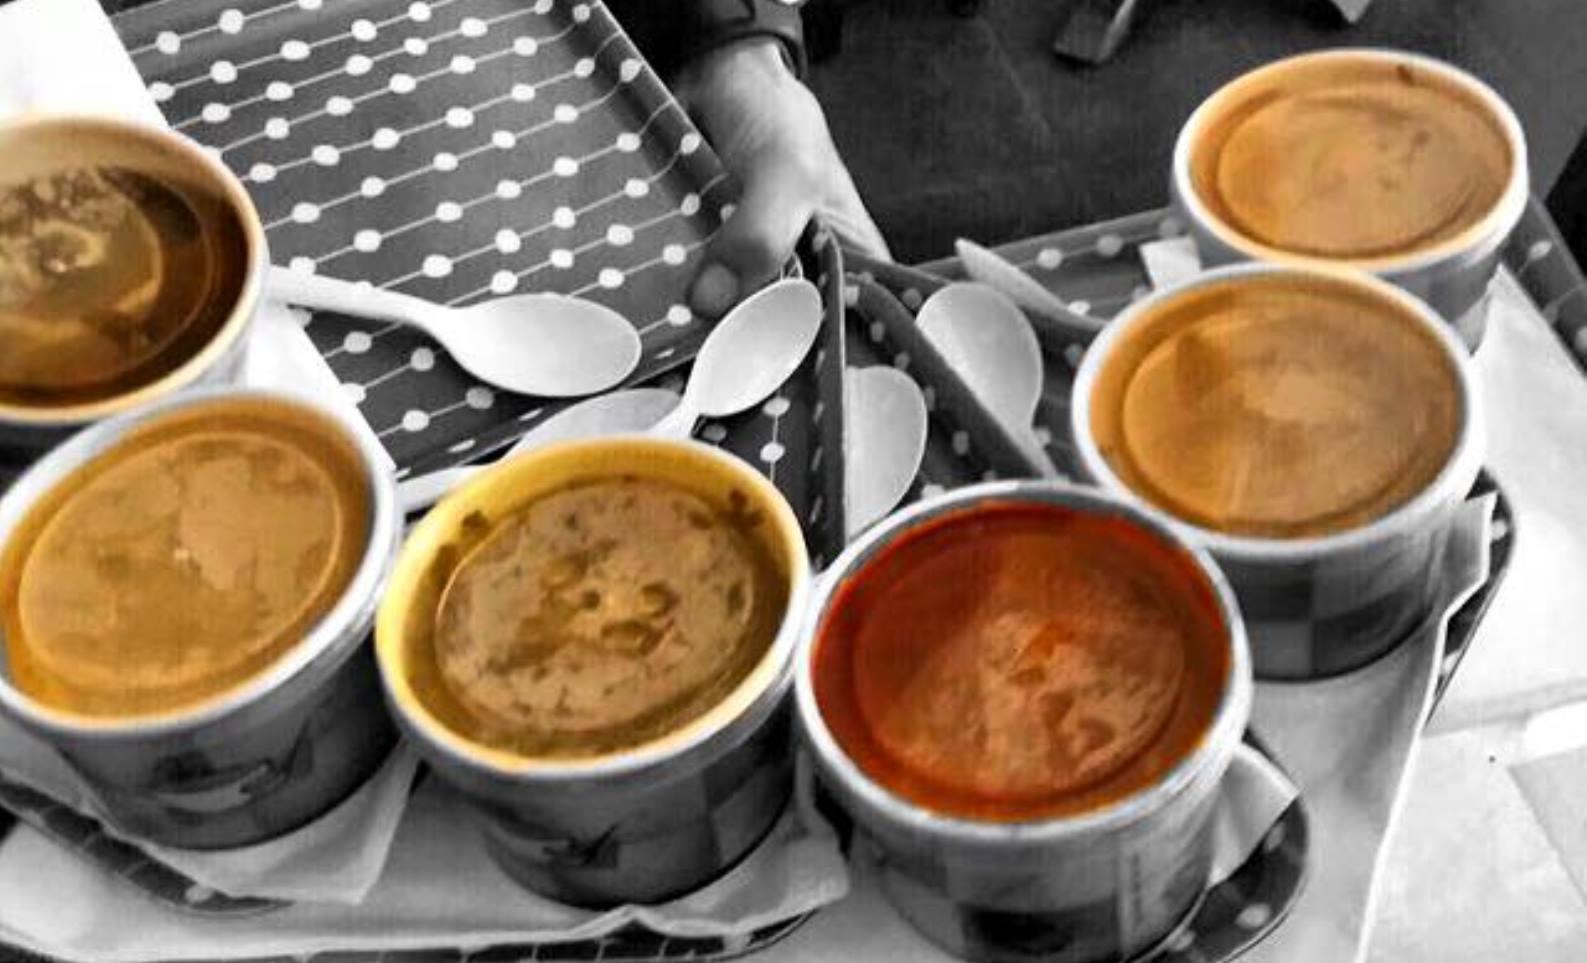 Dishing up soup at Zuppa. Photo via Facebook